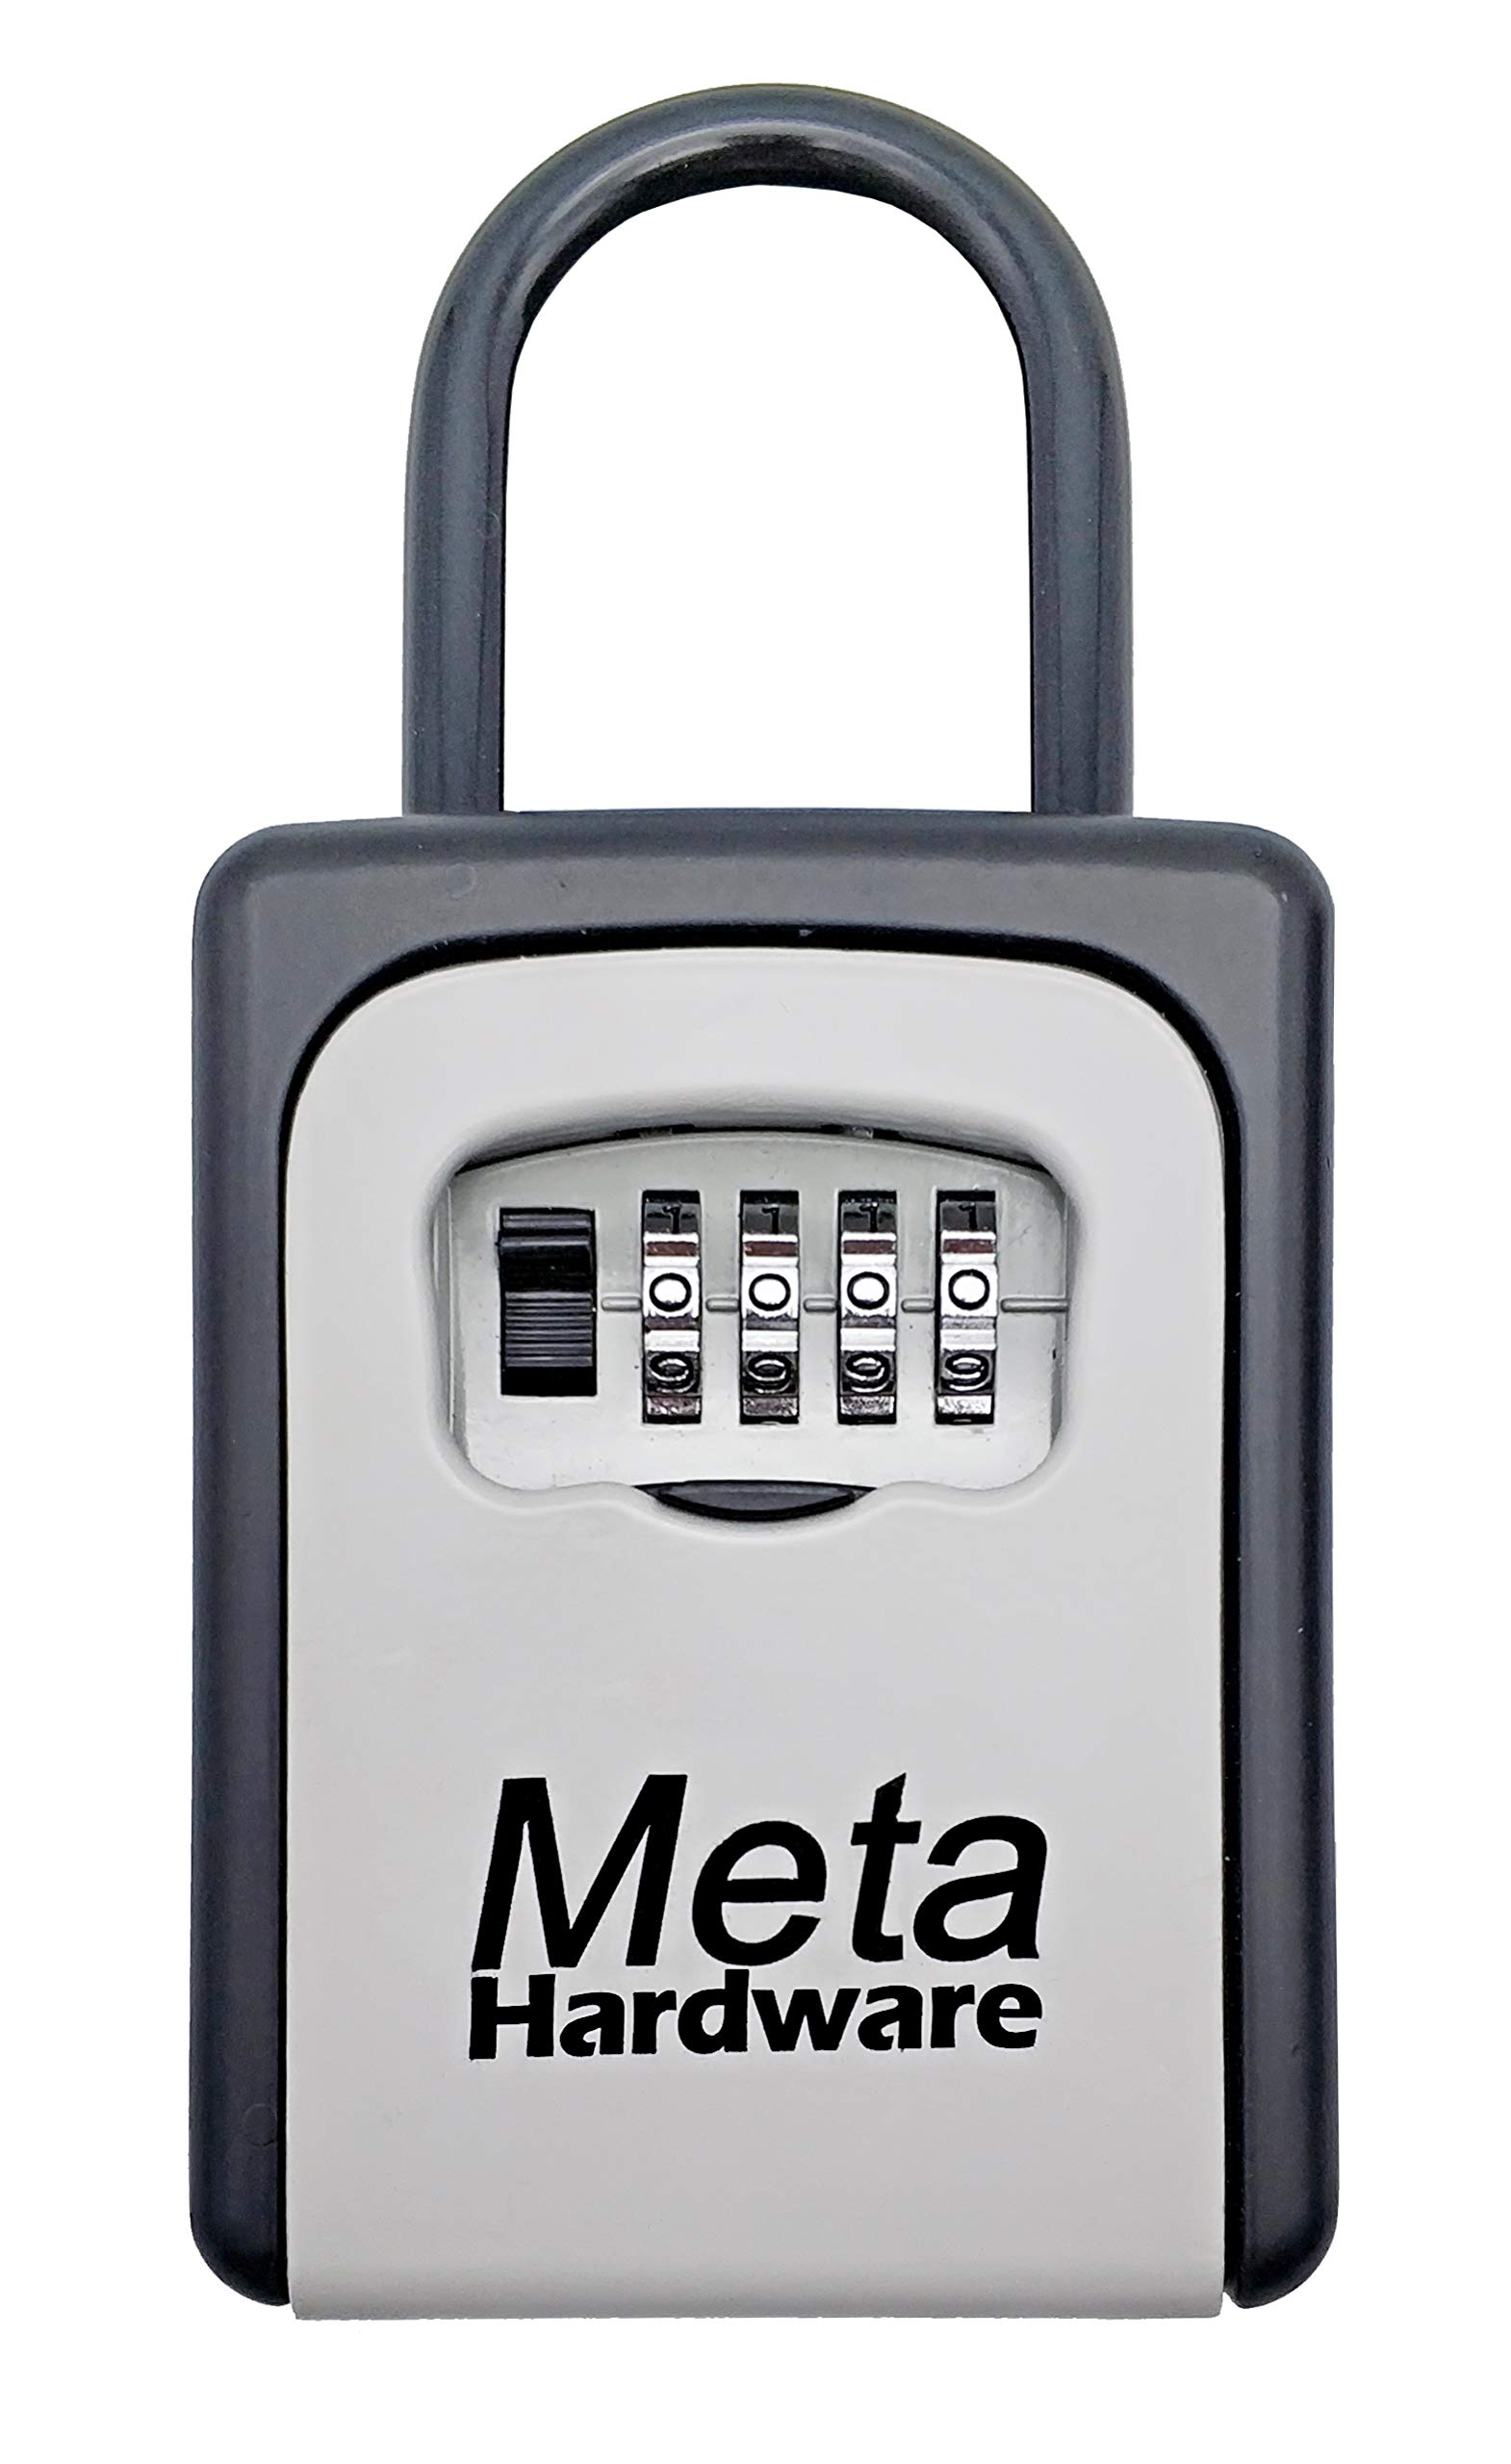 META Hardware Key Lock Box, Key Storage Lock Box, 4-Digit Combination Lock Box, Portable/Wall Mounted Lock Box, Combo Door Lock